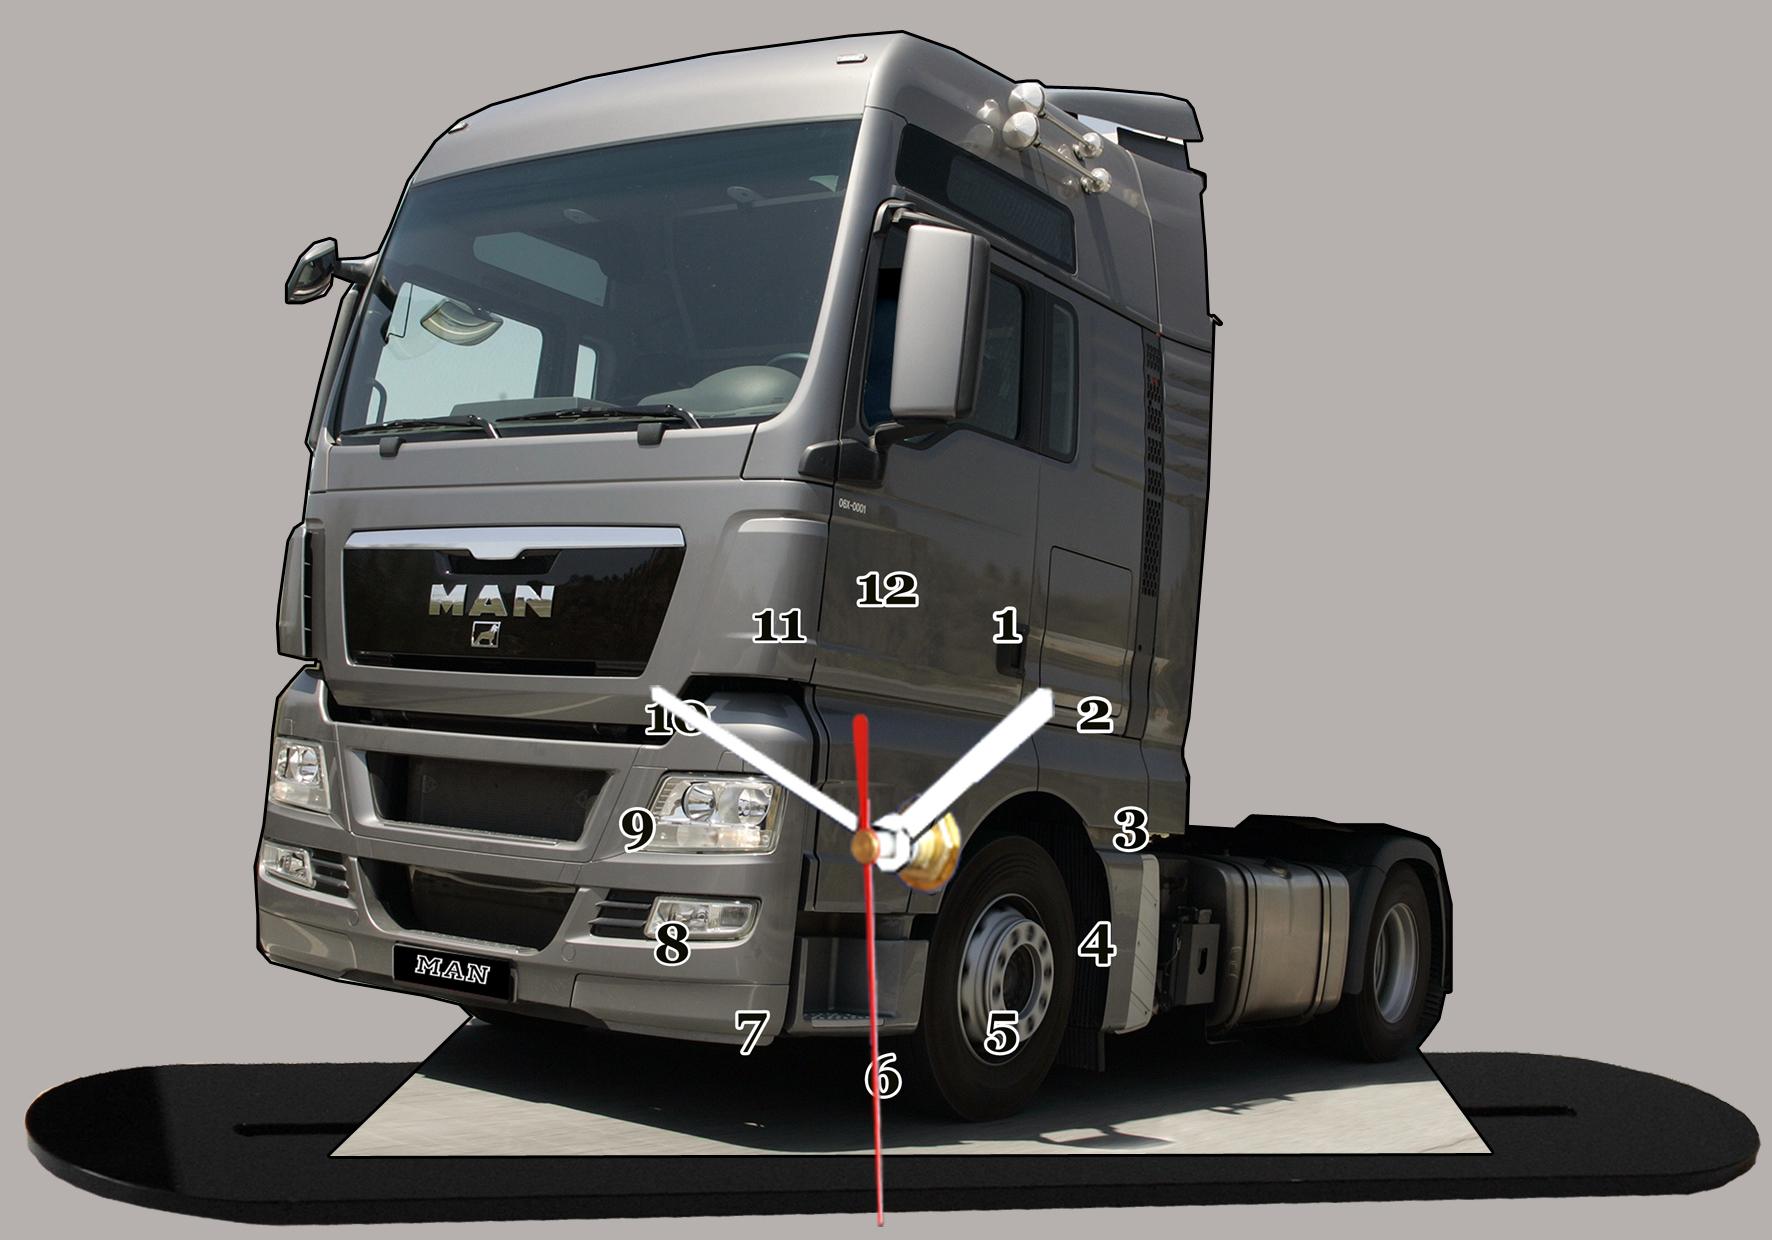 truck allemand man miniature camion truck horloge. Black Bedroom Furniture Sets. Home Design Ideas